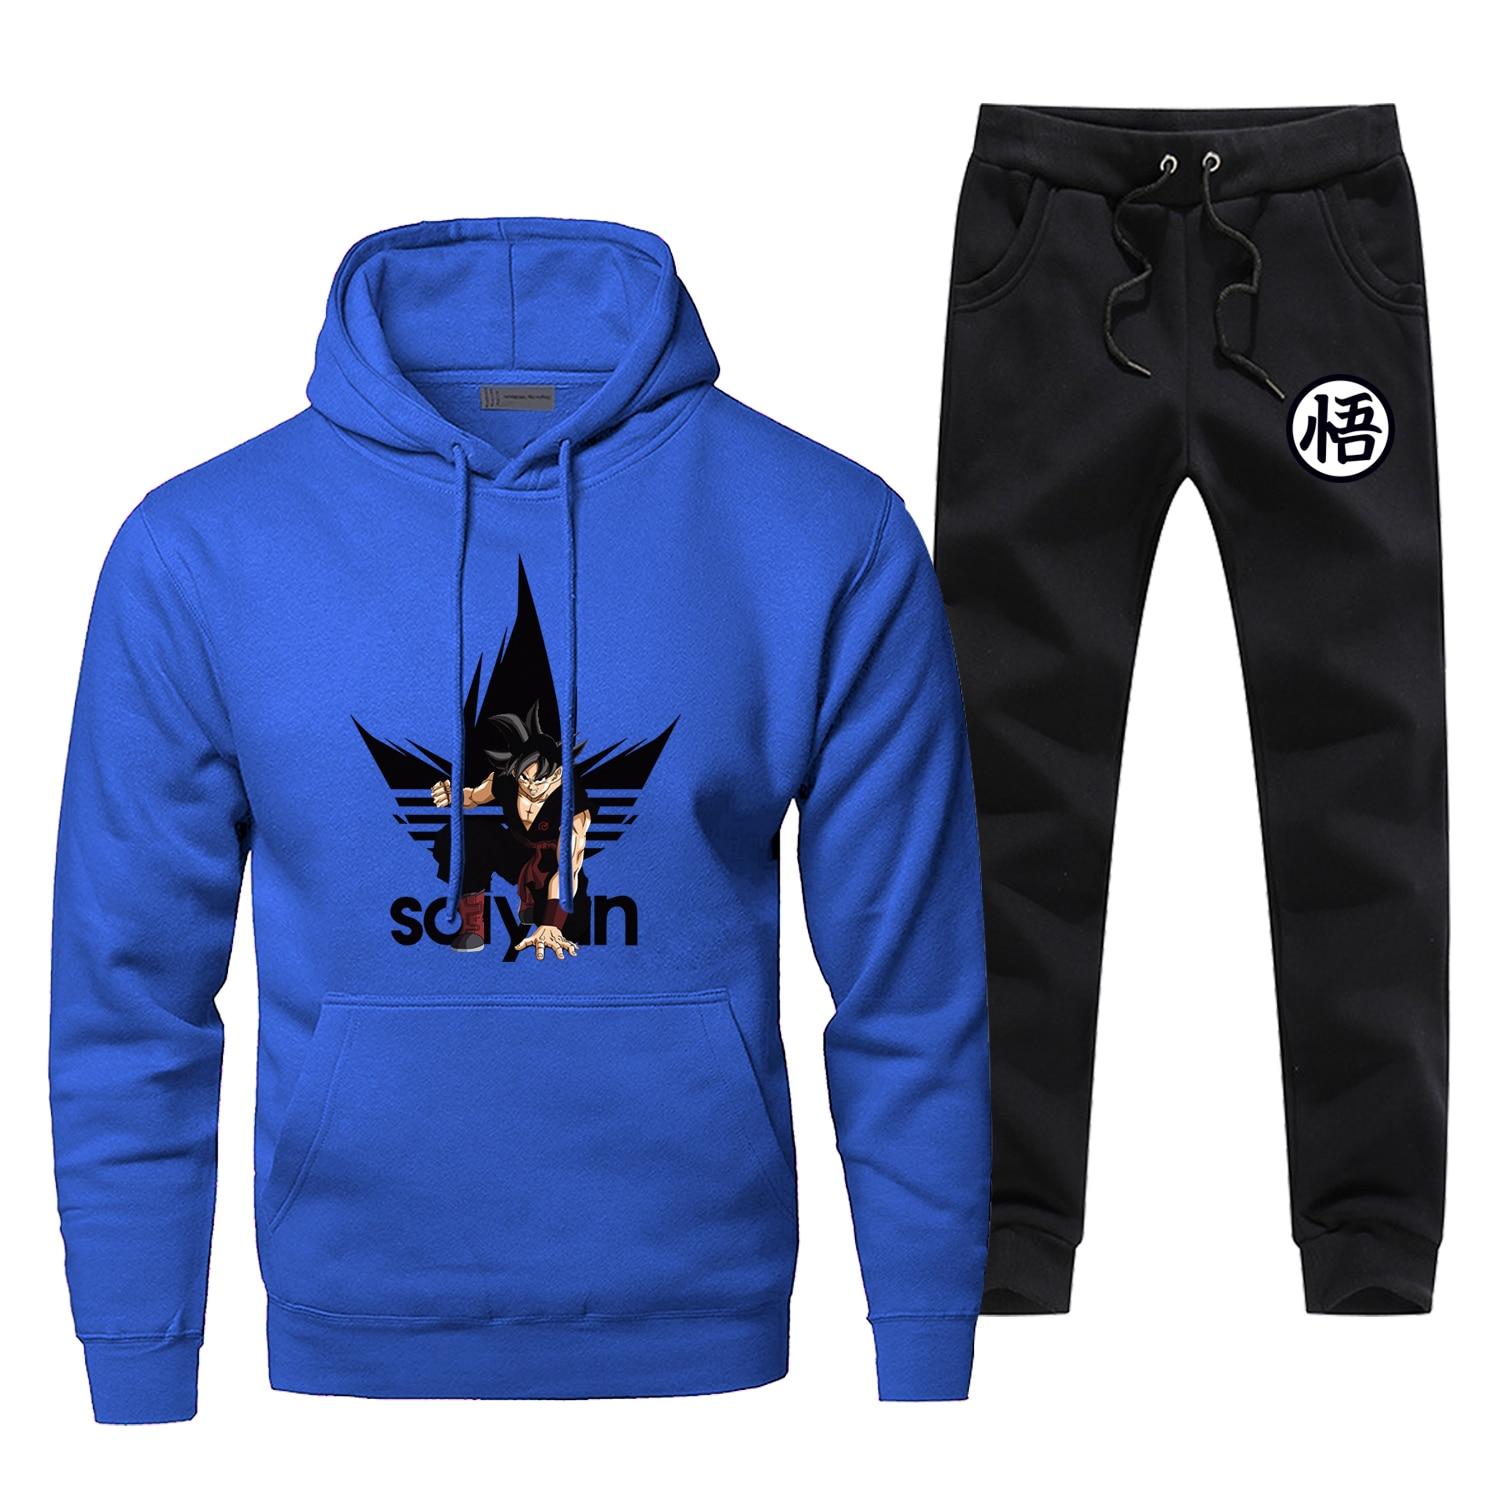 Brand Man Tracksuit Dragon Ball Z Men's Sets Super Saiyan Print Men's Jogging Japan Anime Male Set Harajuku Fleece Hoodies Pants